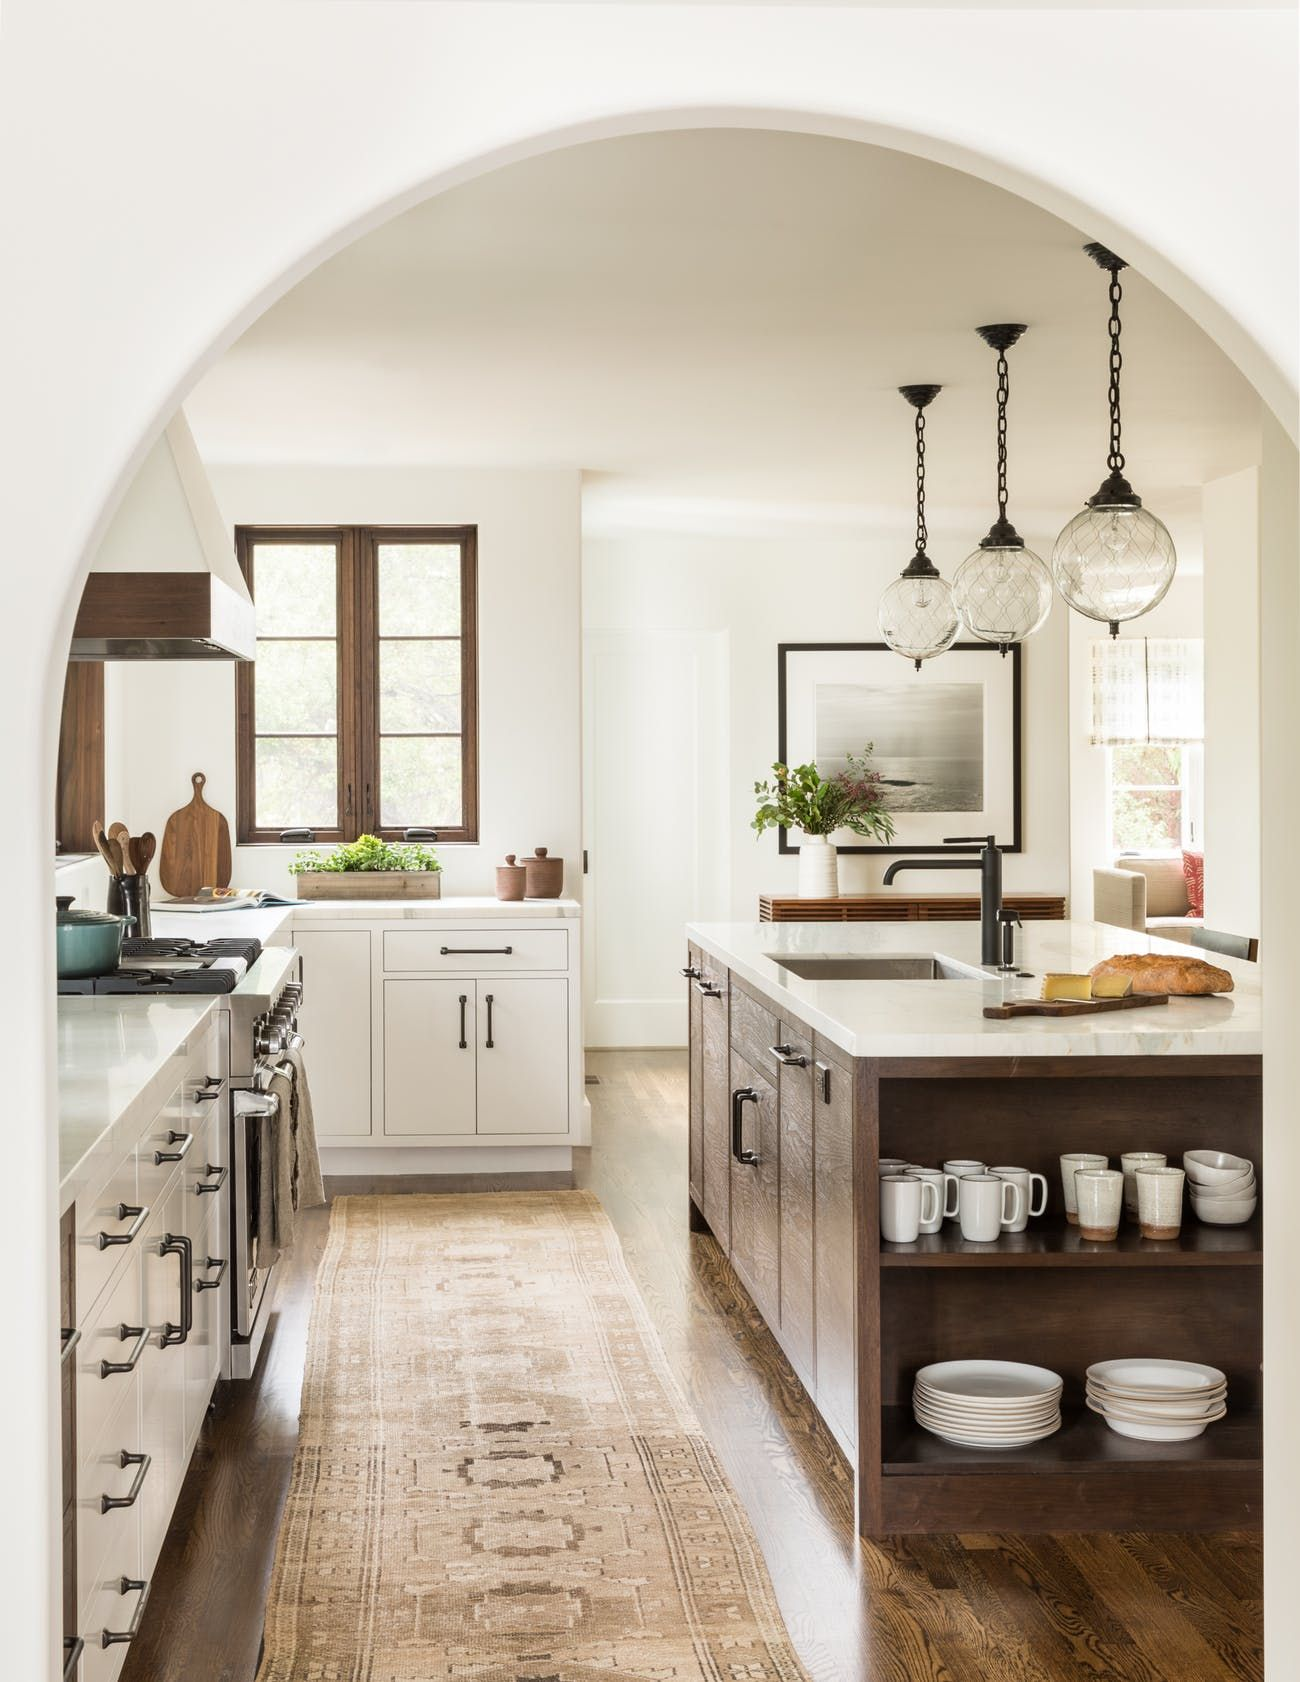 amazing kitchens Kitchen Dining Pinterest Kitchens Kitchen